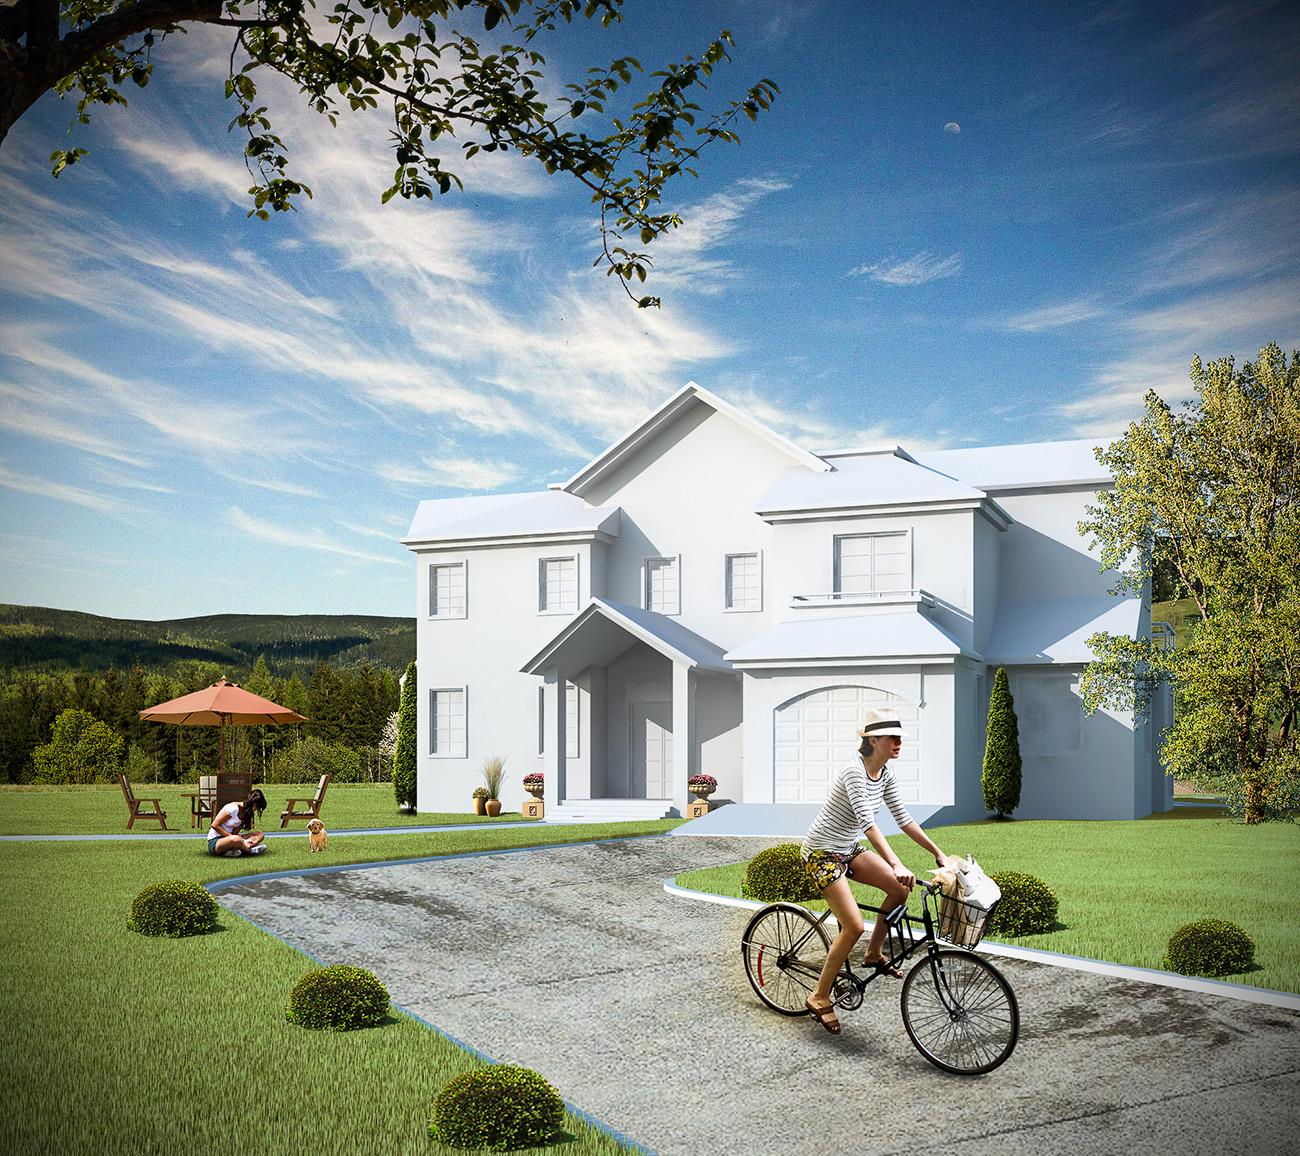 3ds Max İle Villa Modelleme Eğitim Seti